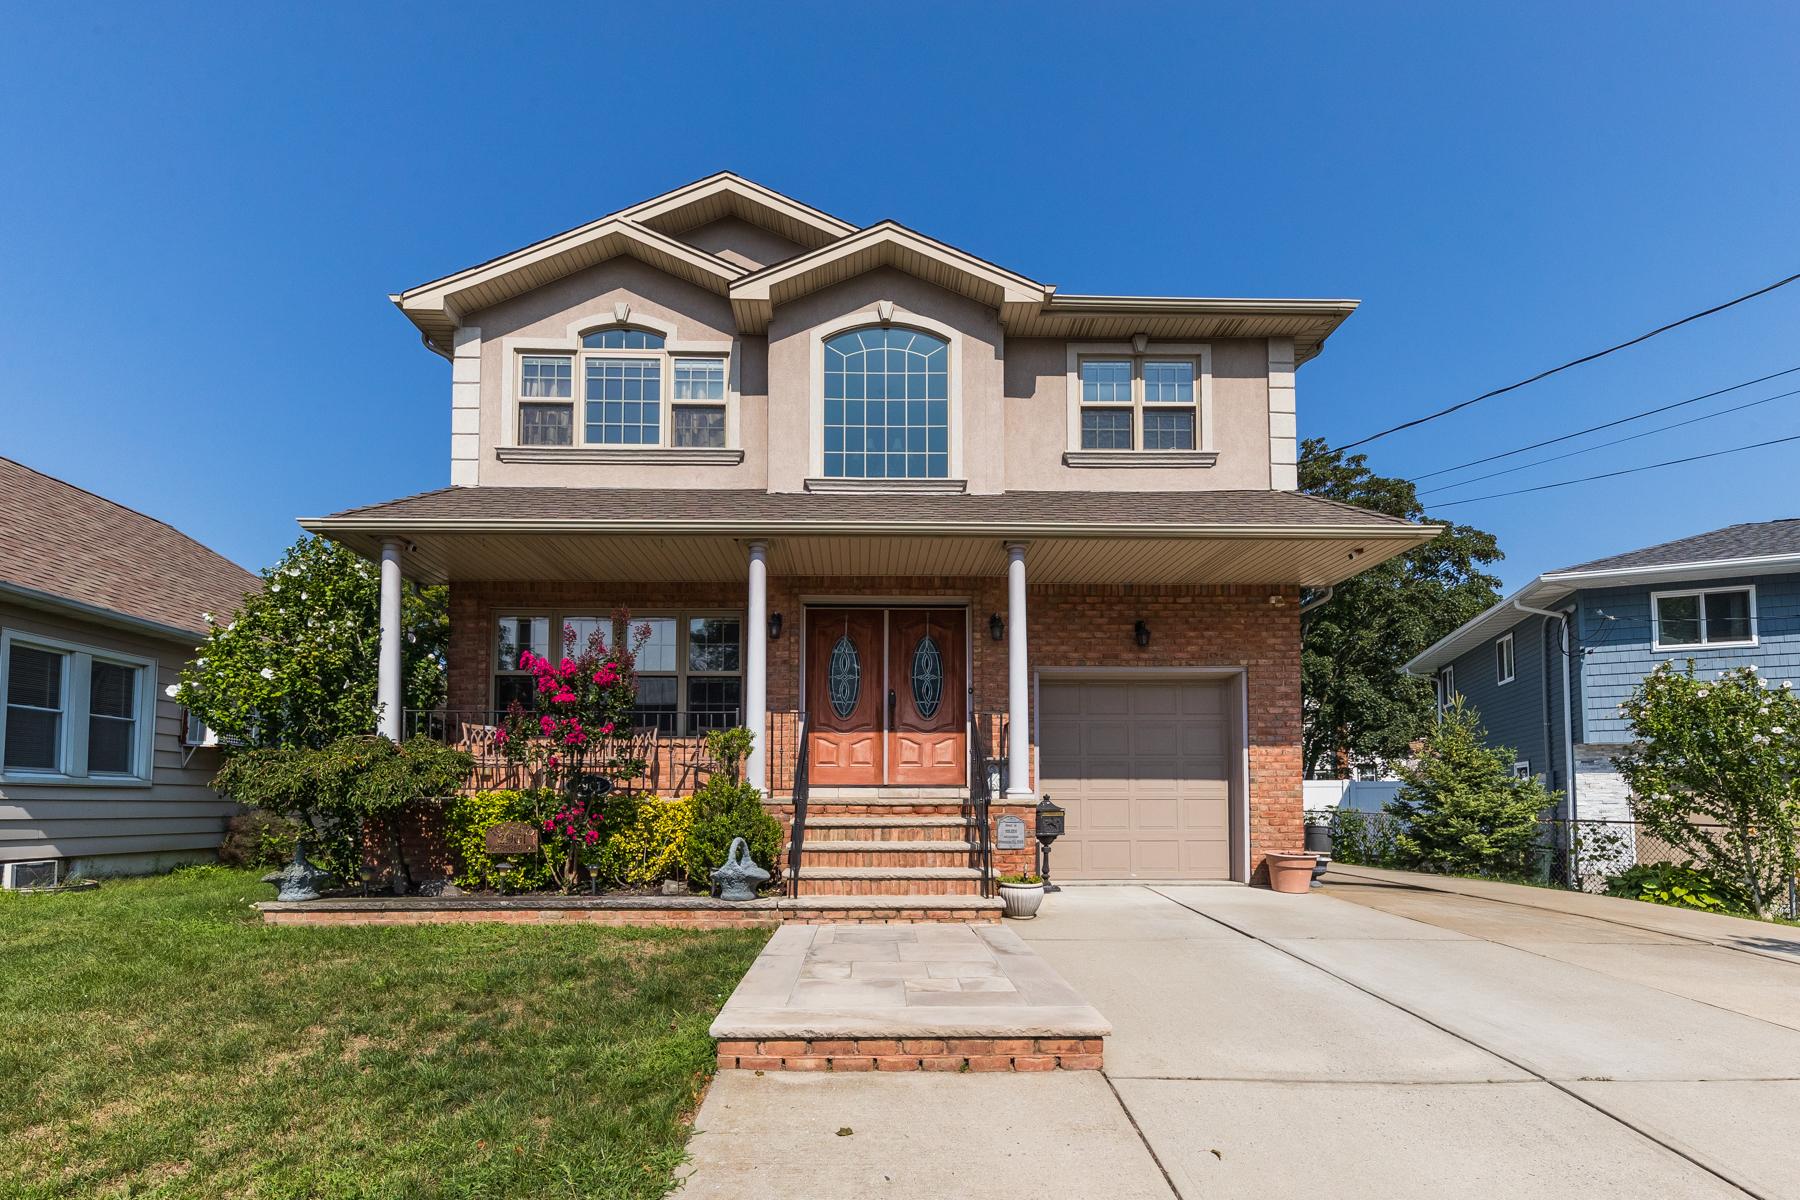 Single Family Homes for Sale at Oceanside 2901 Beverly Rd Oceanside, New York 11572 United States